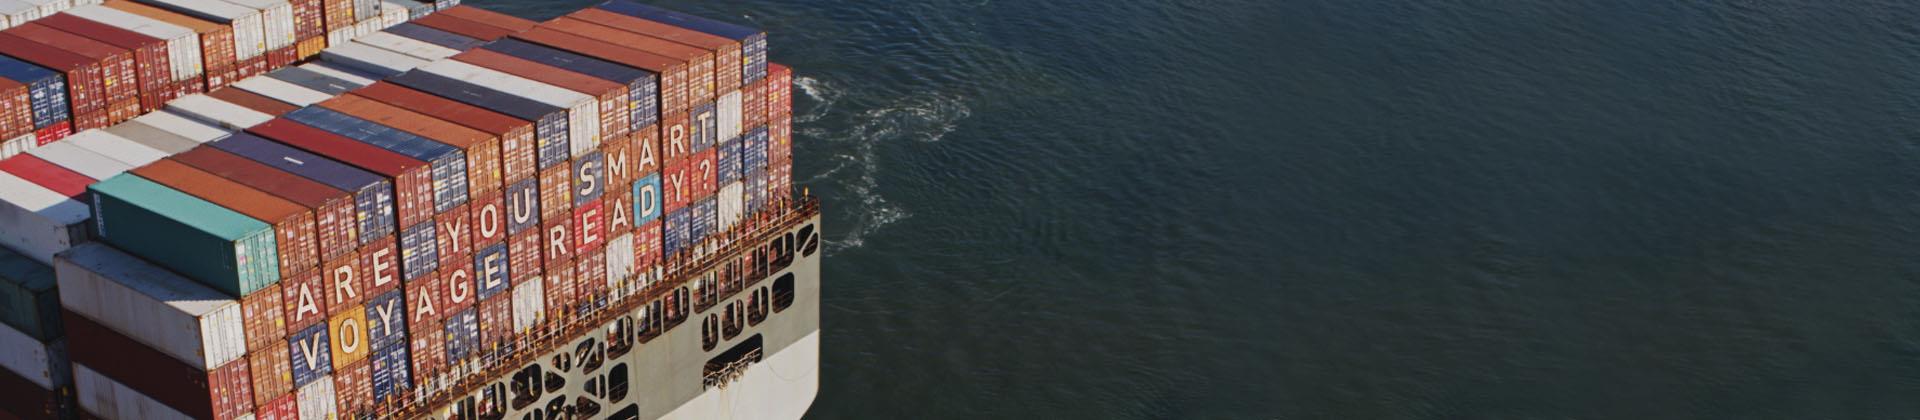 smart voyage banner